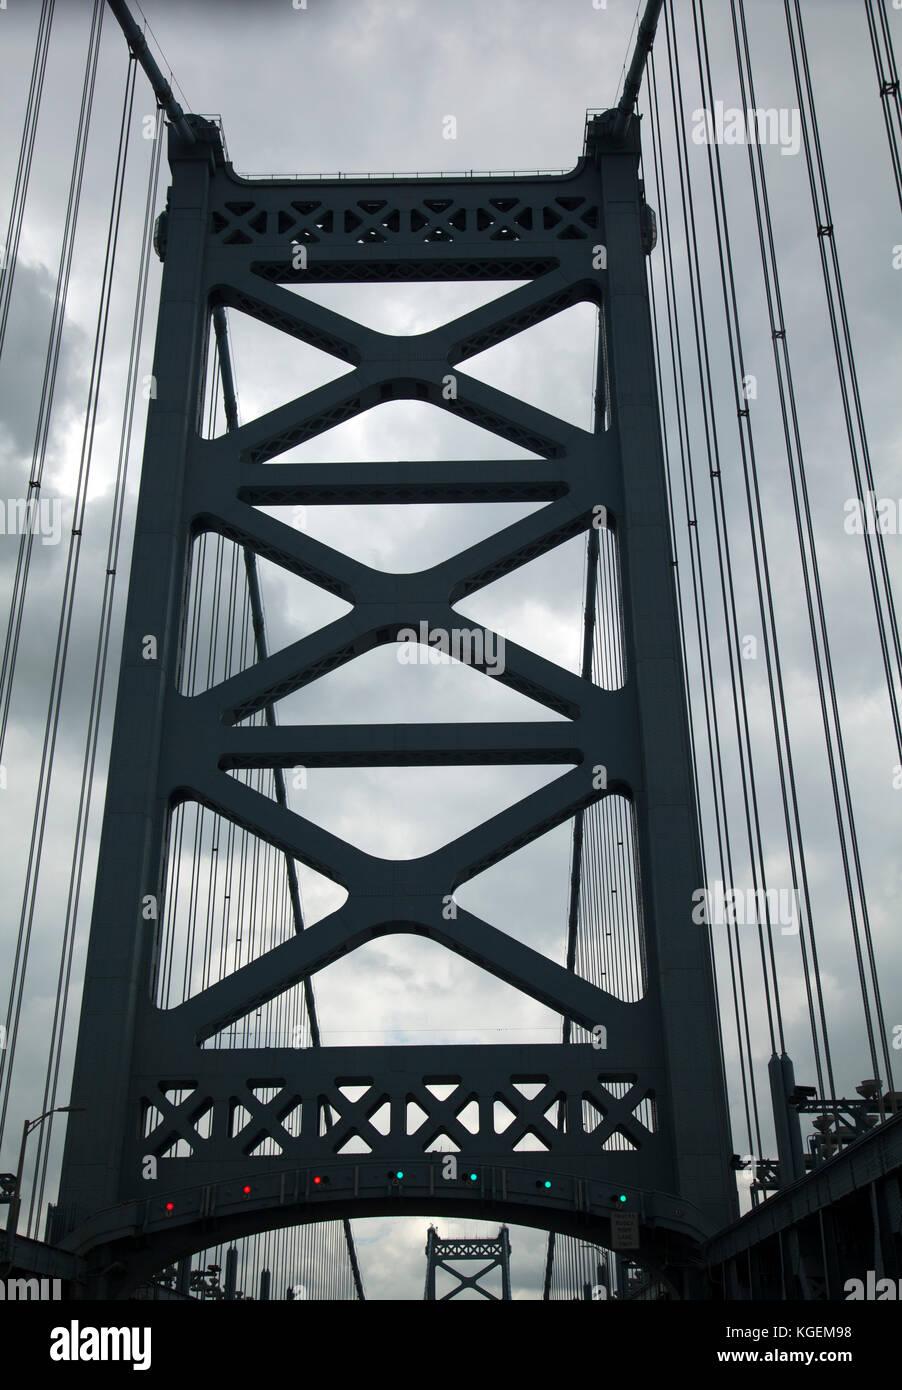 Benjamin Franklin Bridge Connecting Philadelphia to New Jersey - USA Stock Photo